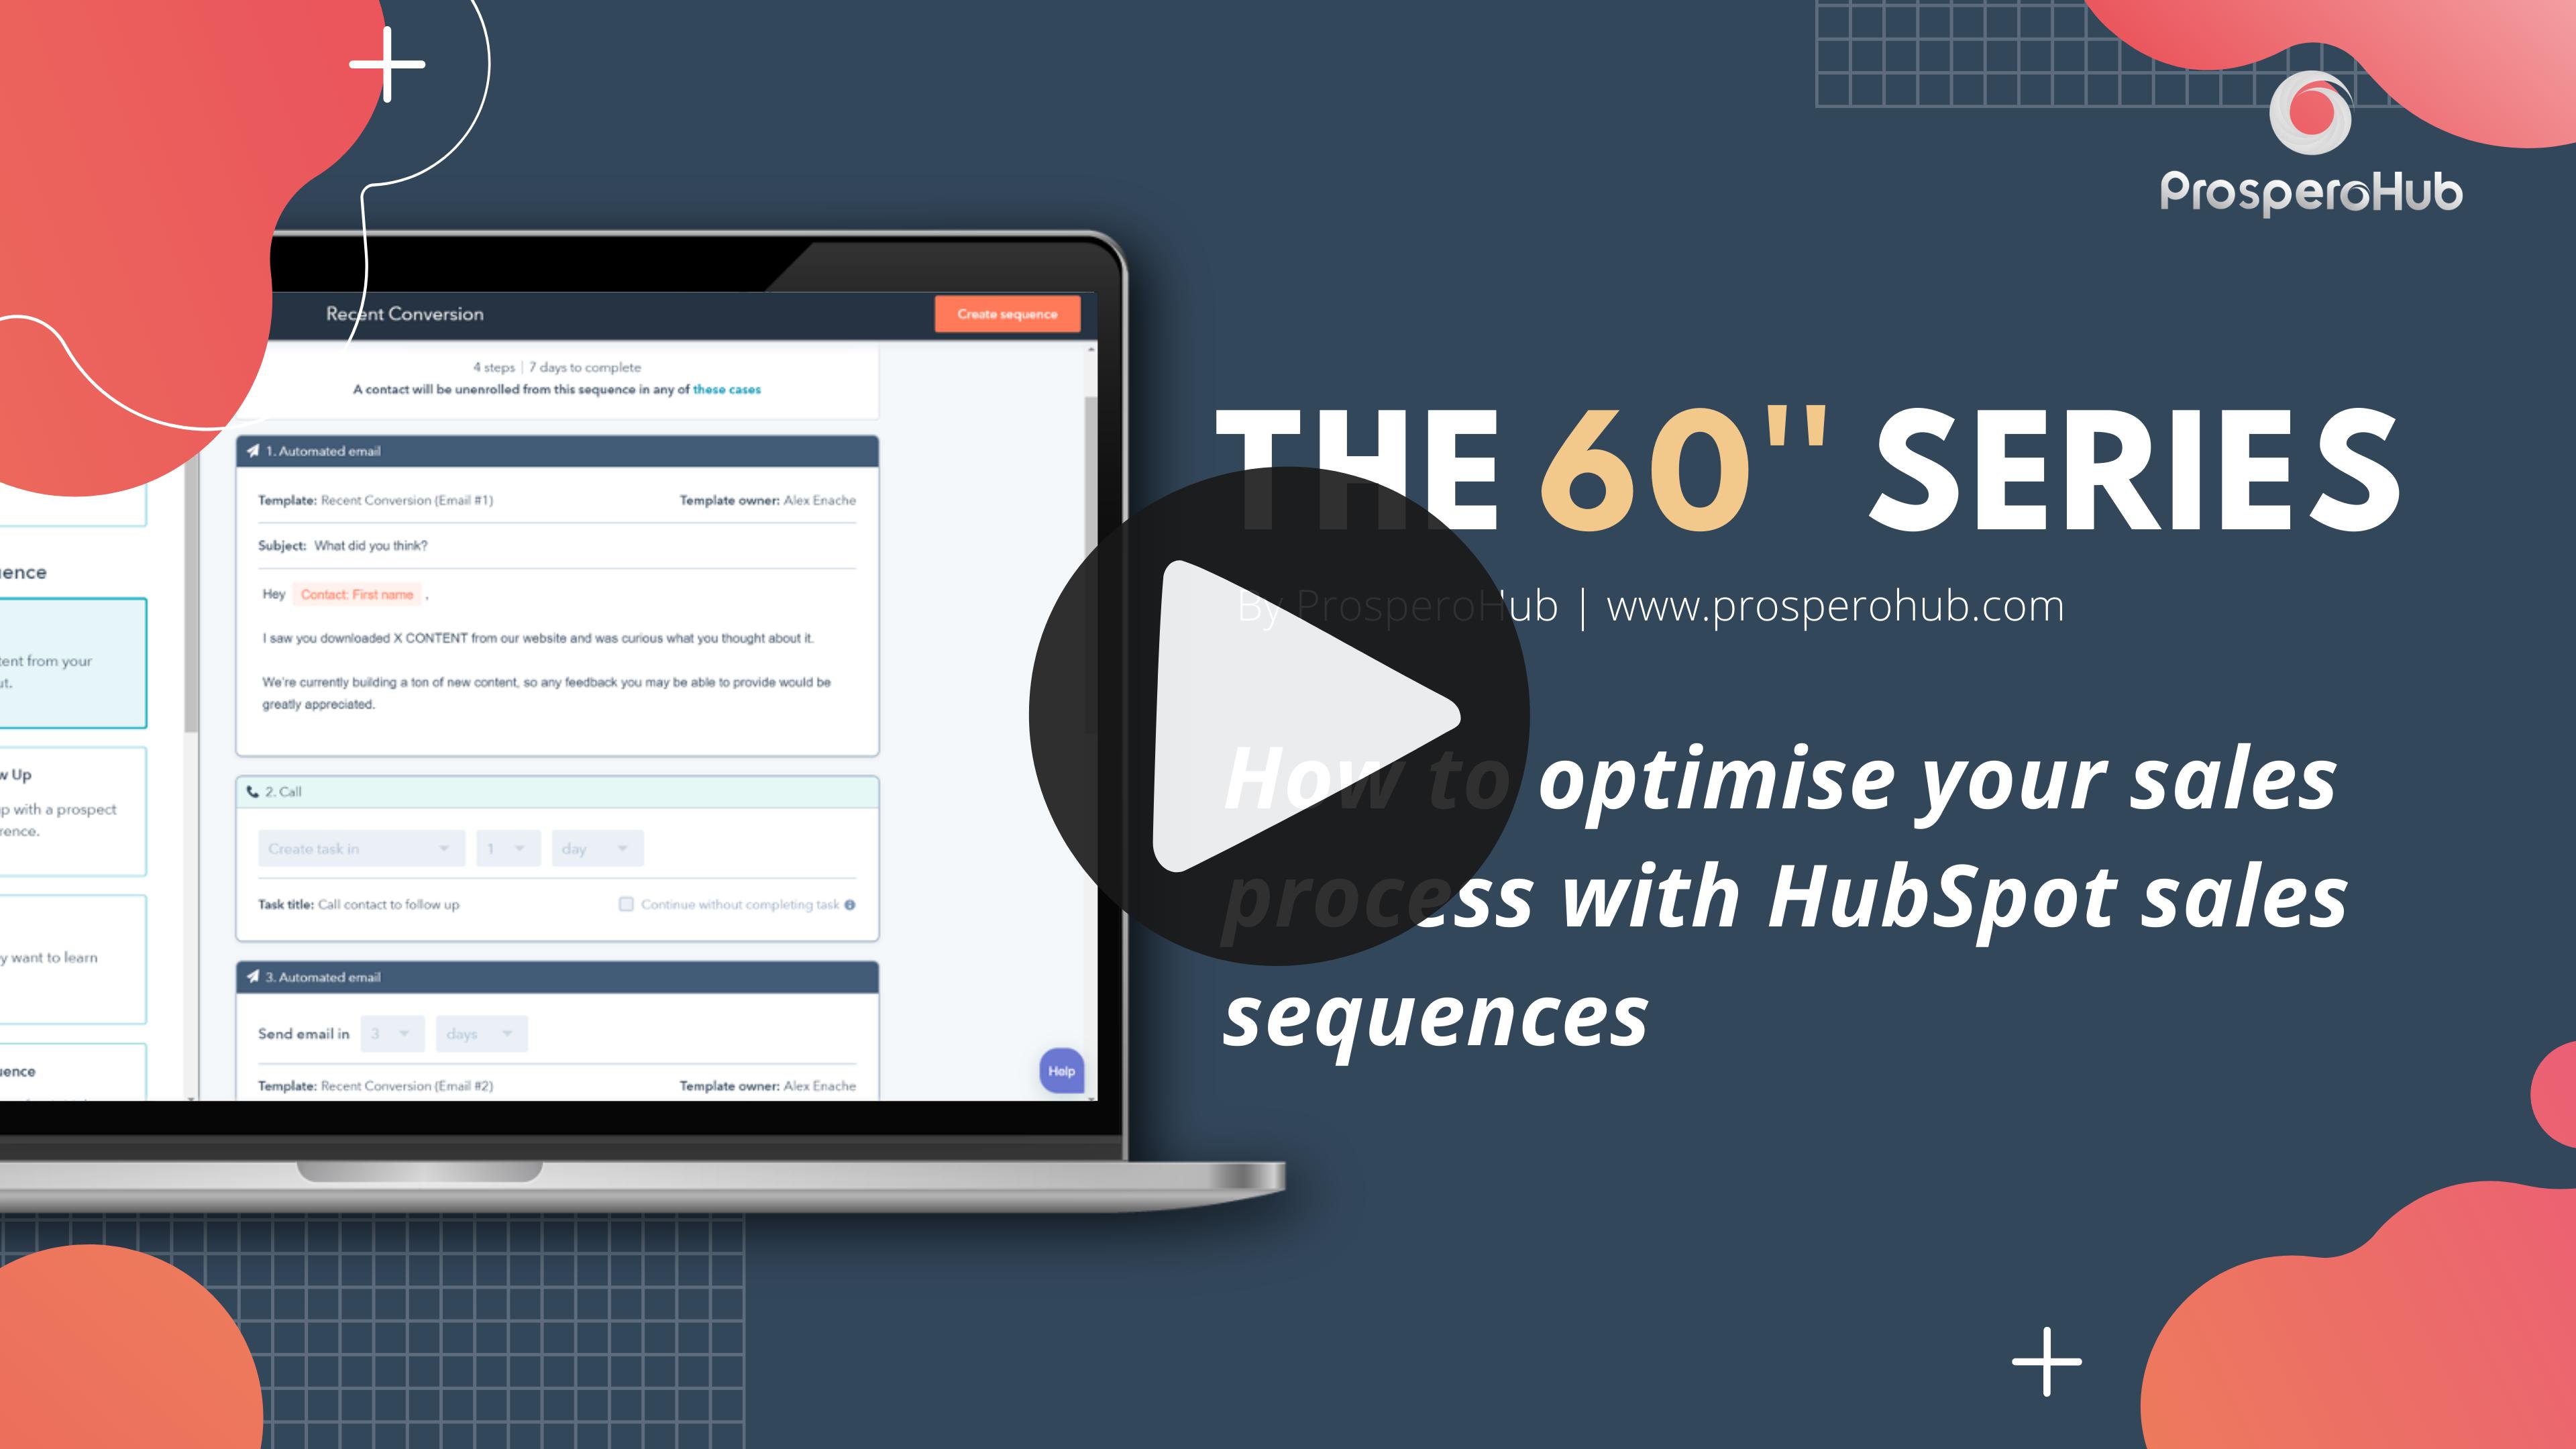 PH - 60 second series - HubSpot sales sequences